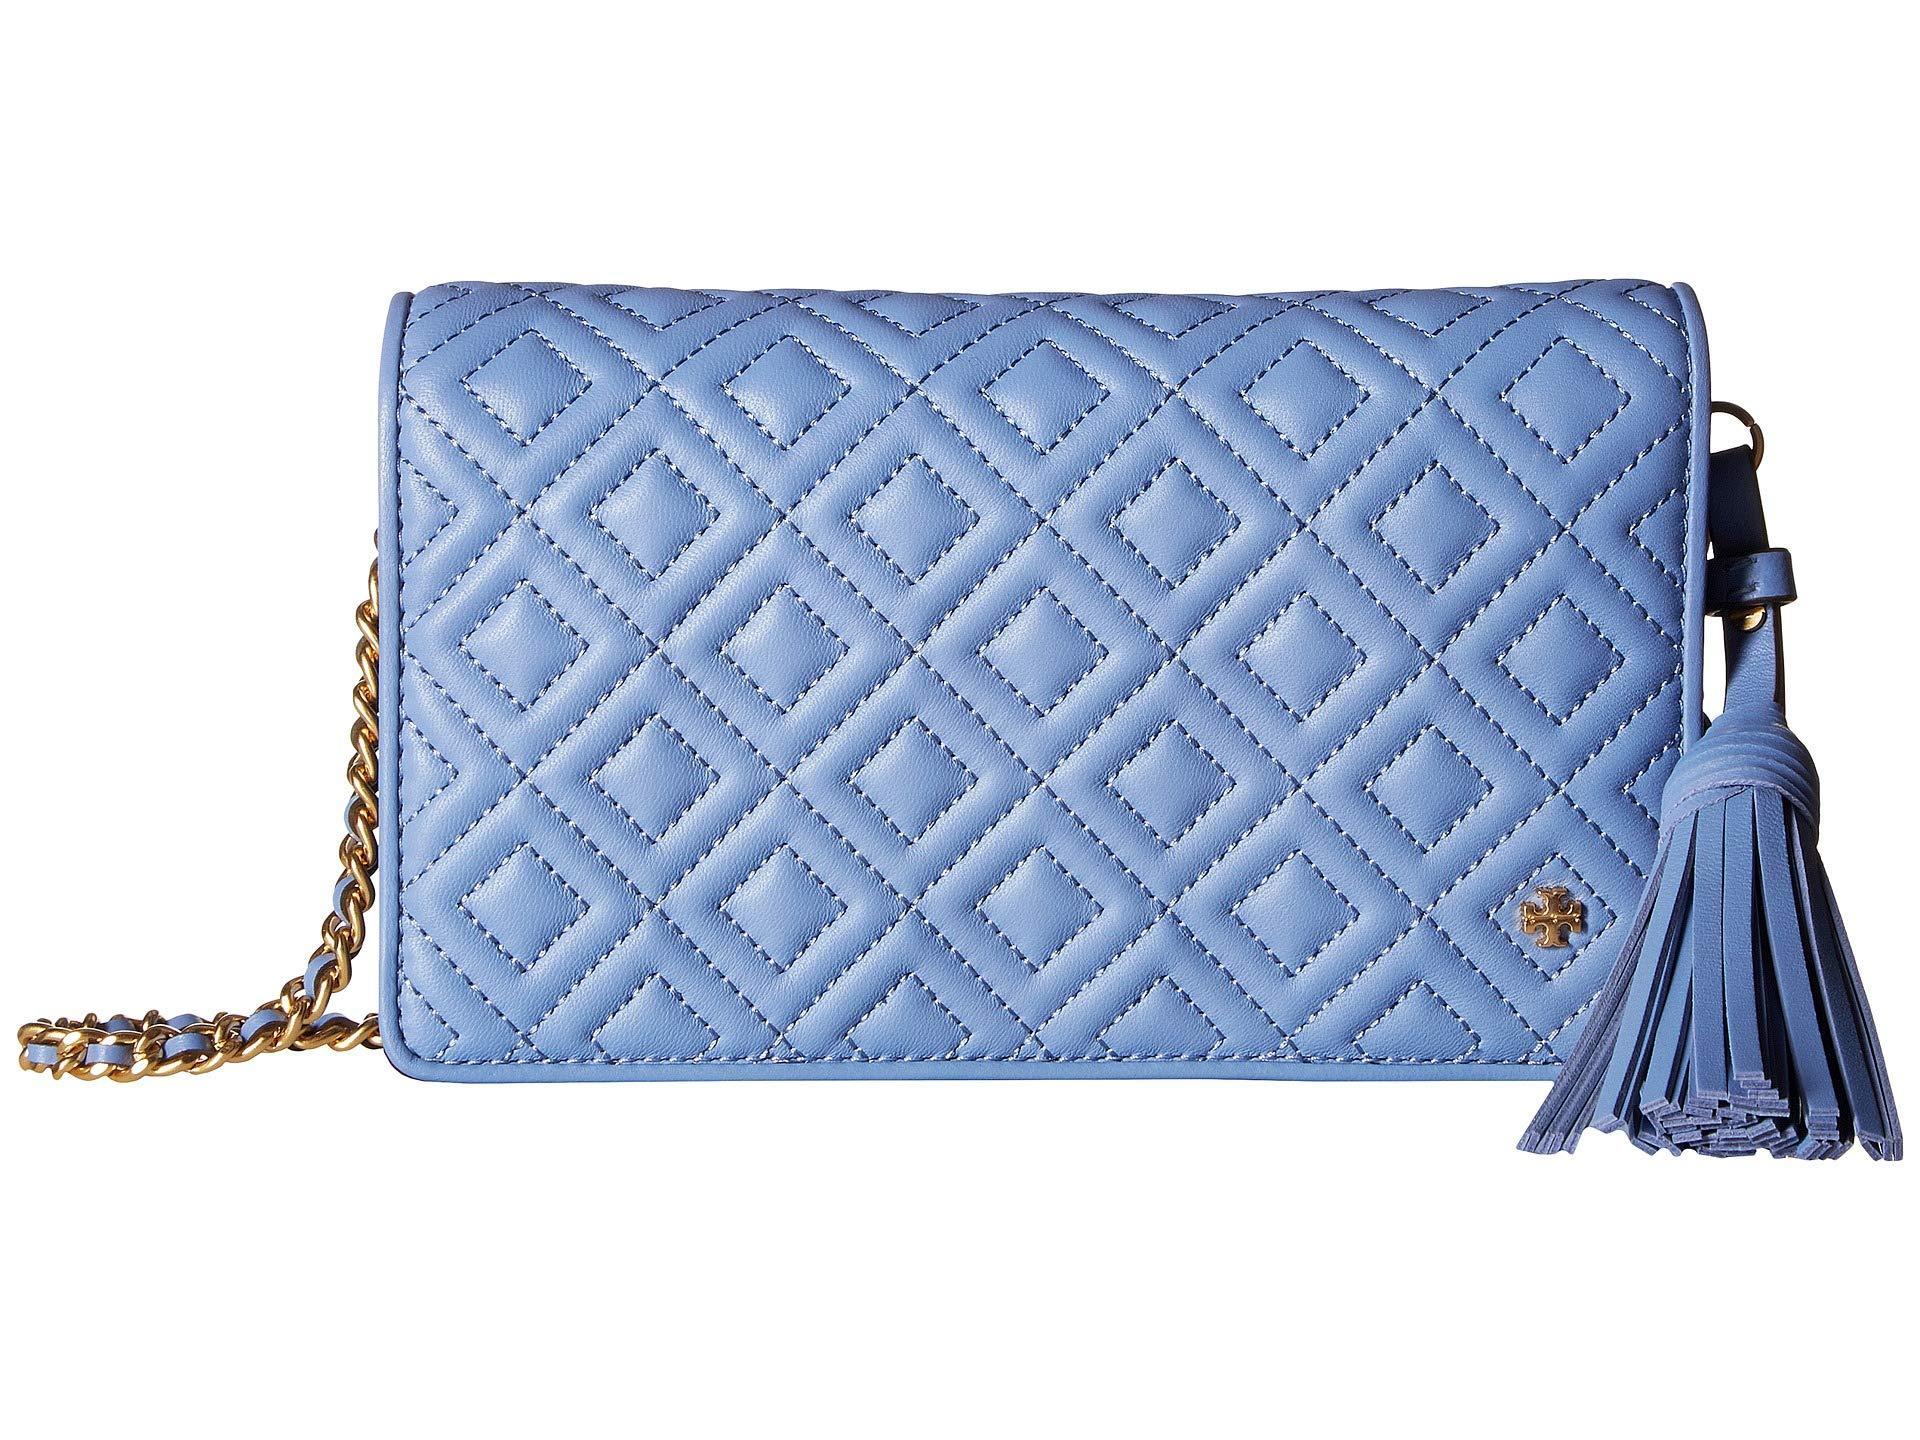 fa095496d32 Lyst - Tory Burch Fleming Flat Wallet Crossbody in Blue - Save 30%